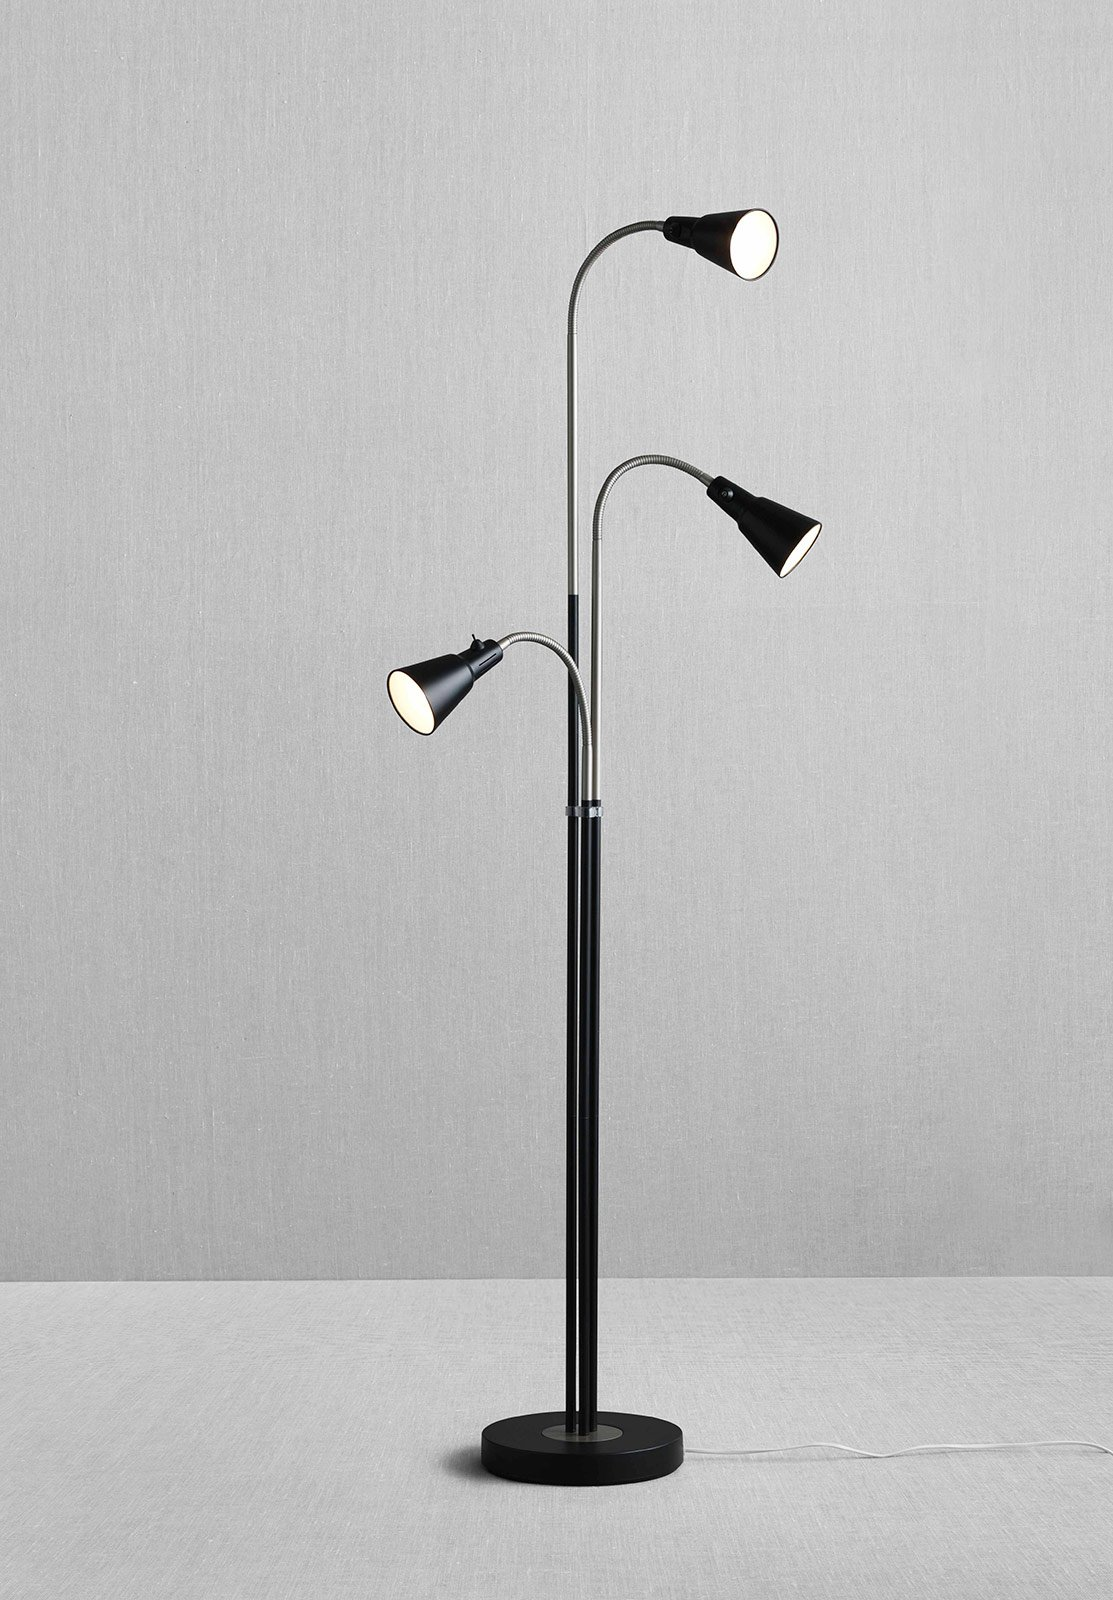 Lampade da terra per ogni ambiente cose di casa for Ikea lampada scrivania